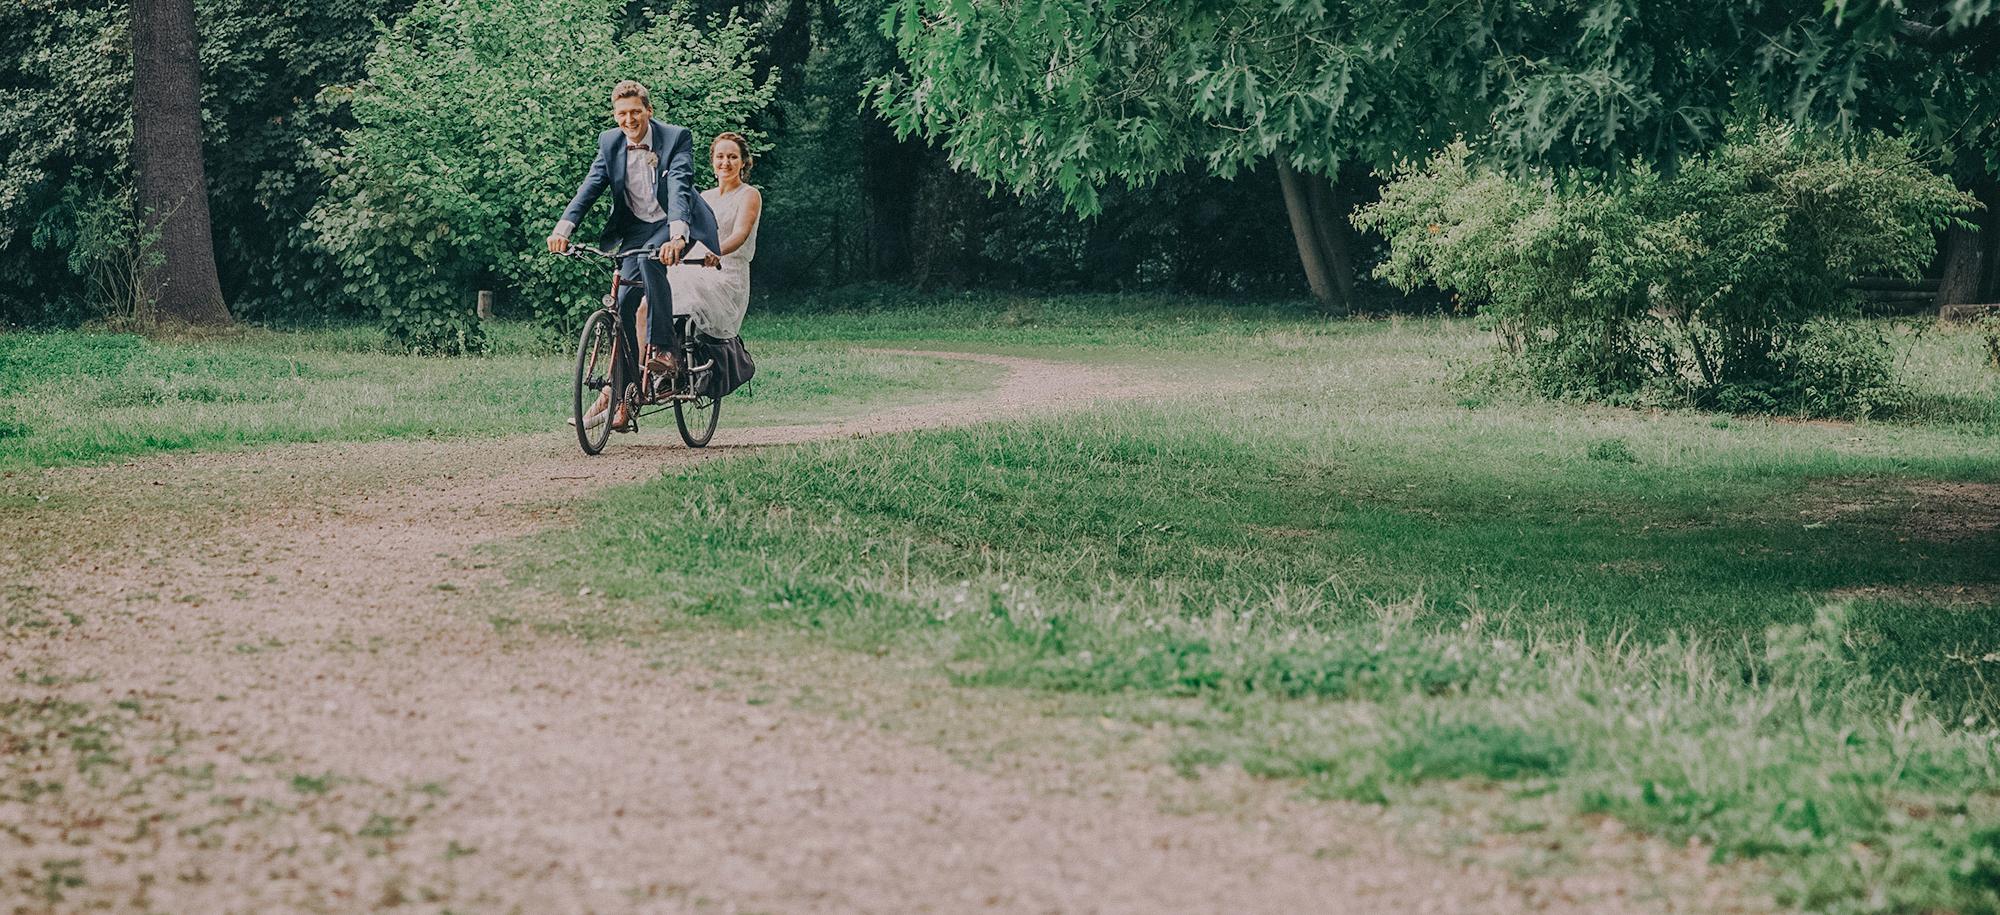 Hochzeit_Potsdam_fotograf_G30